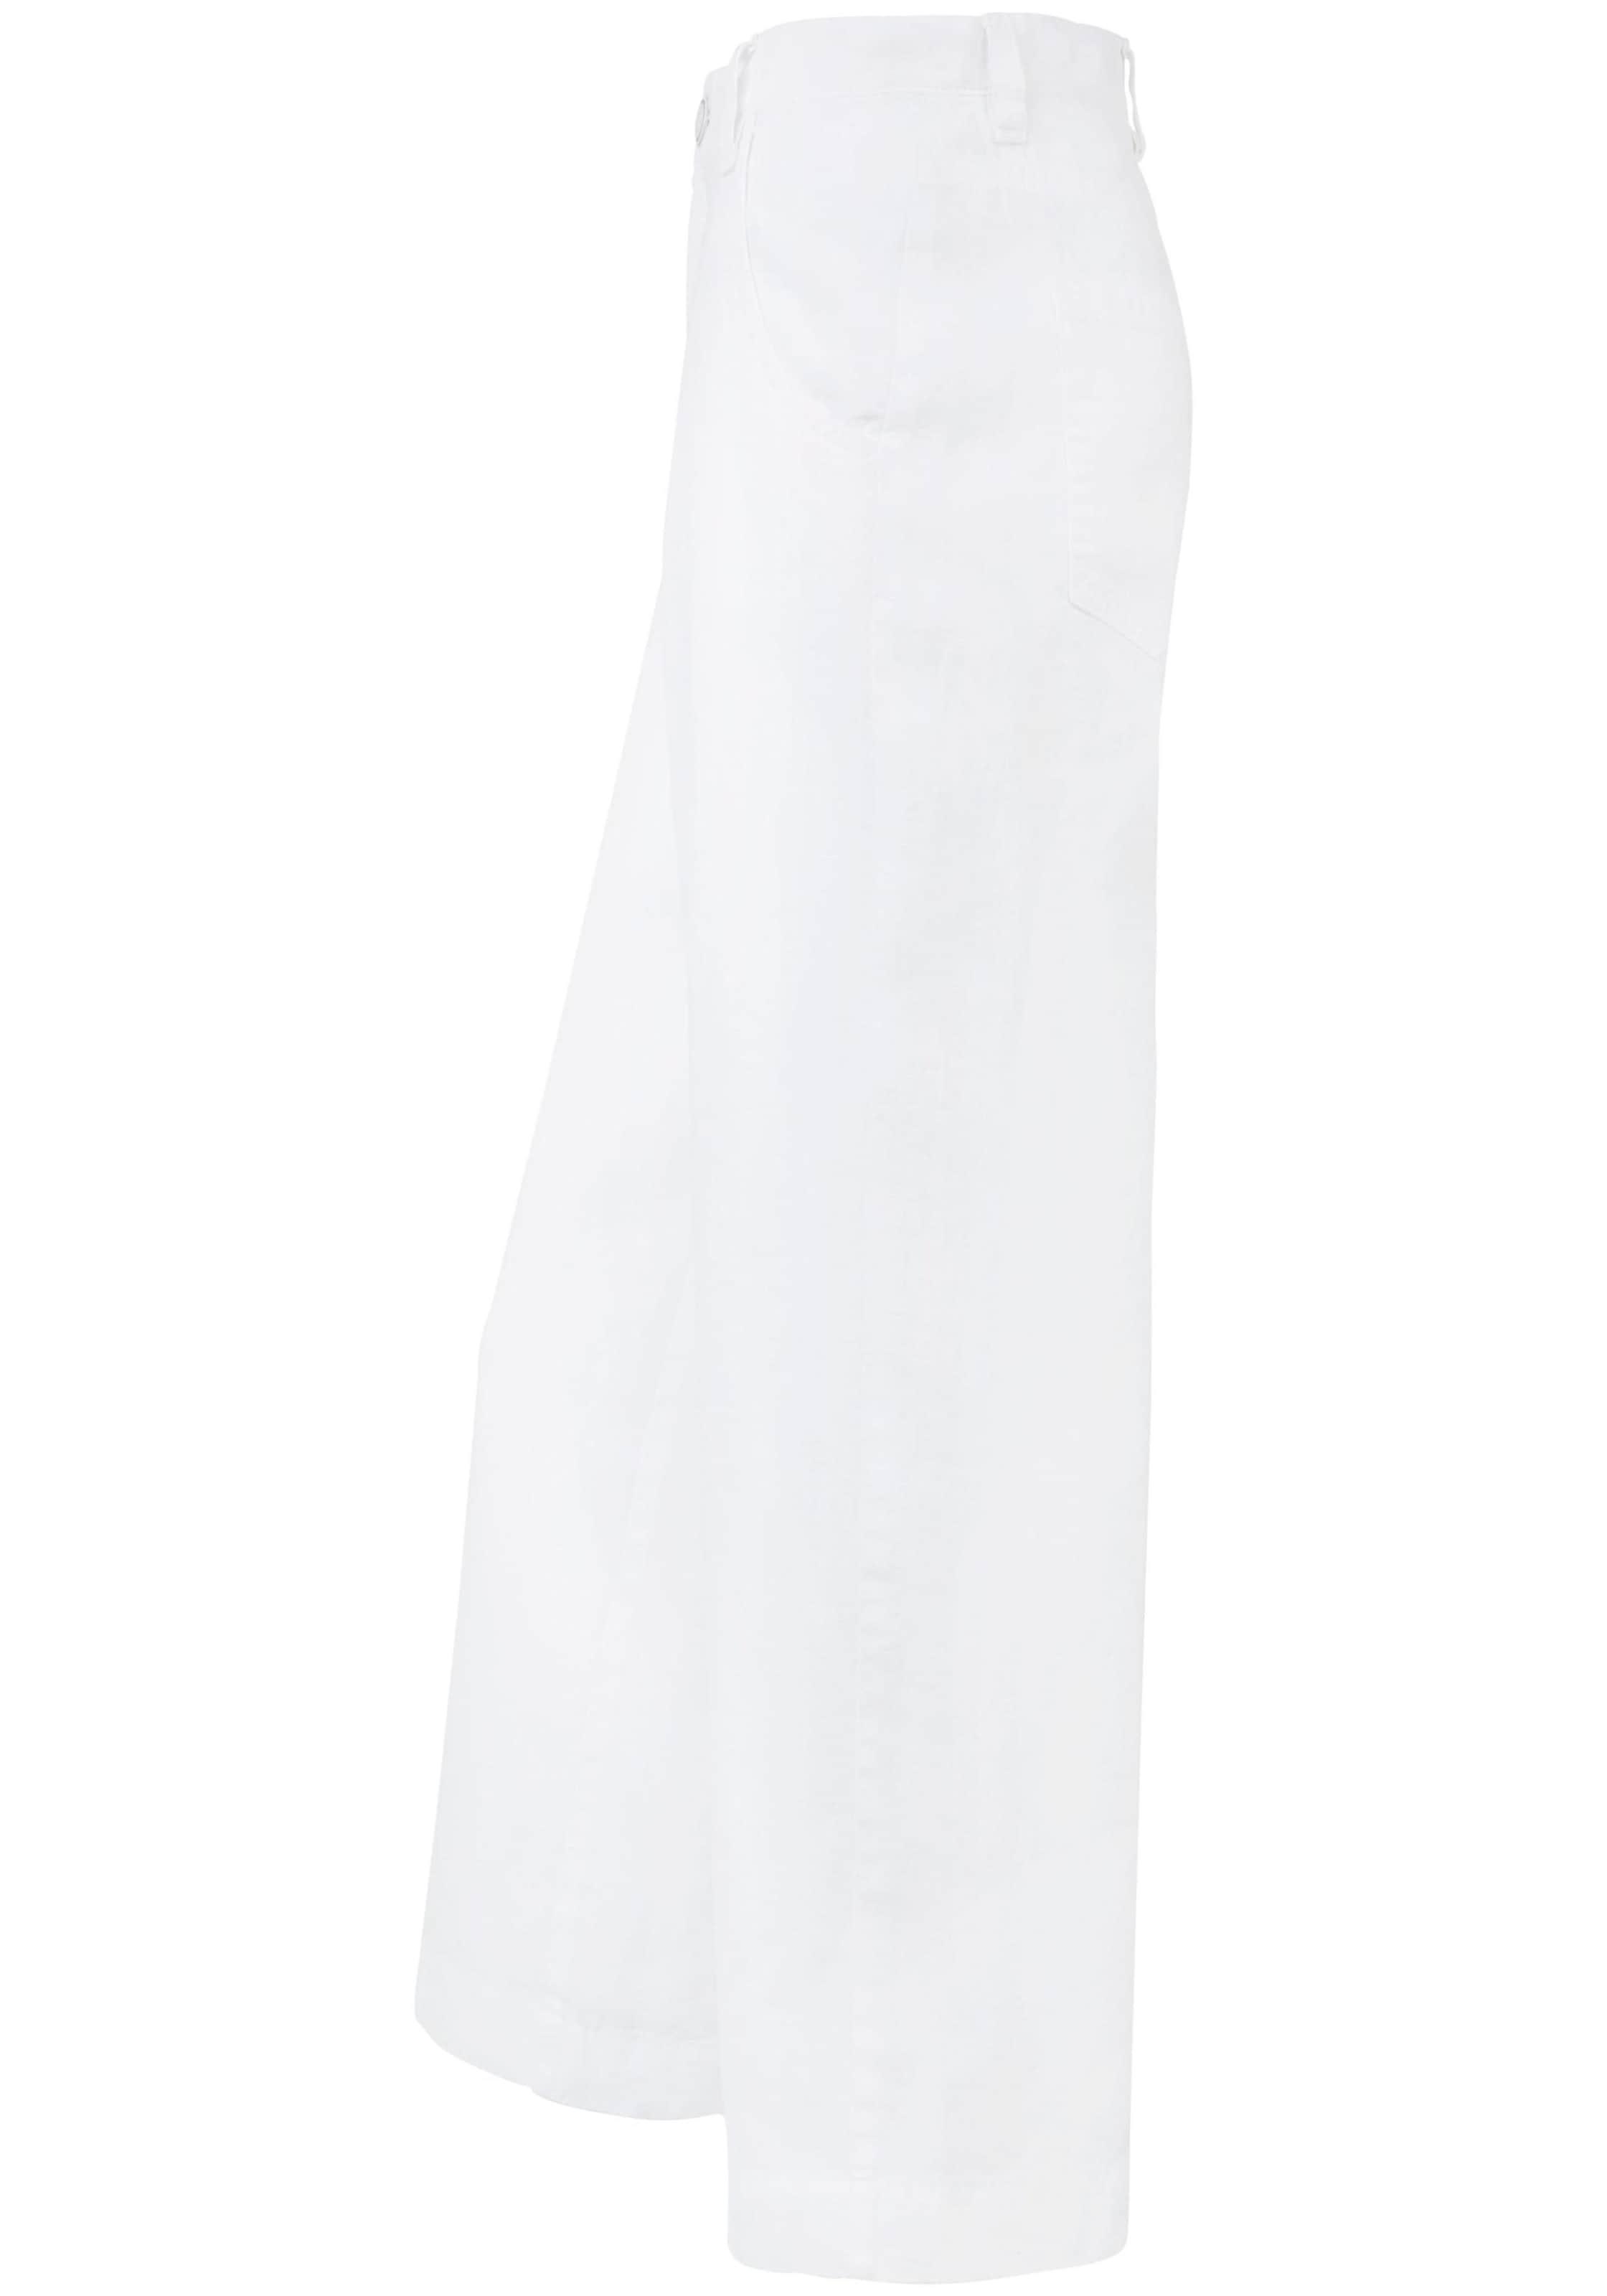 Peter Hahn Culotte 'Cornelia' in weiß